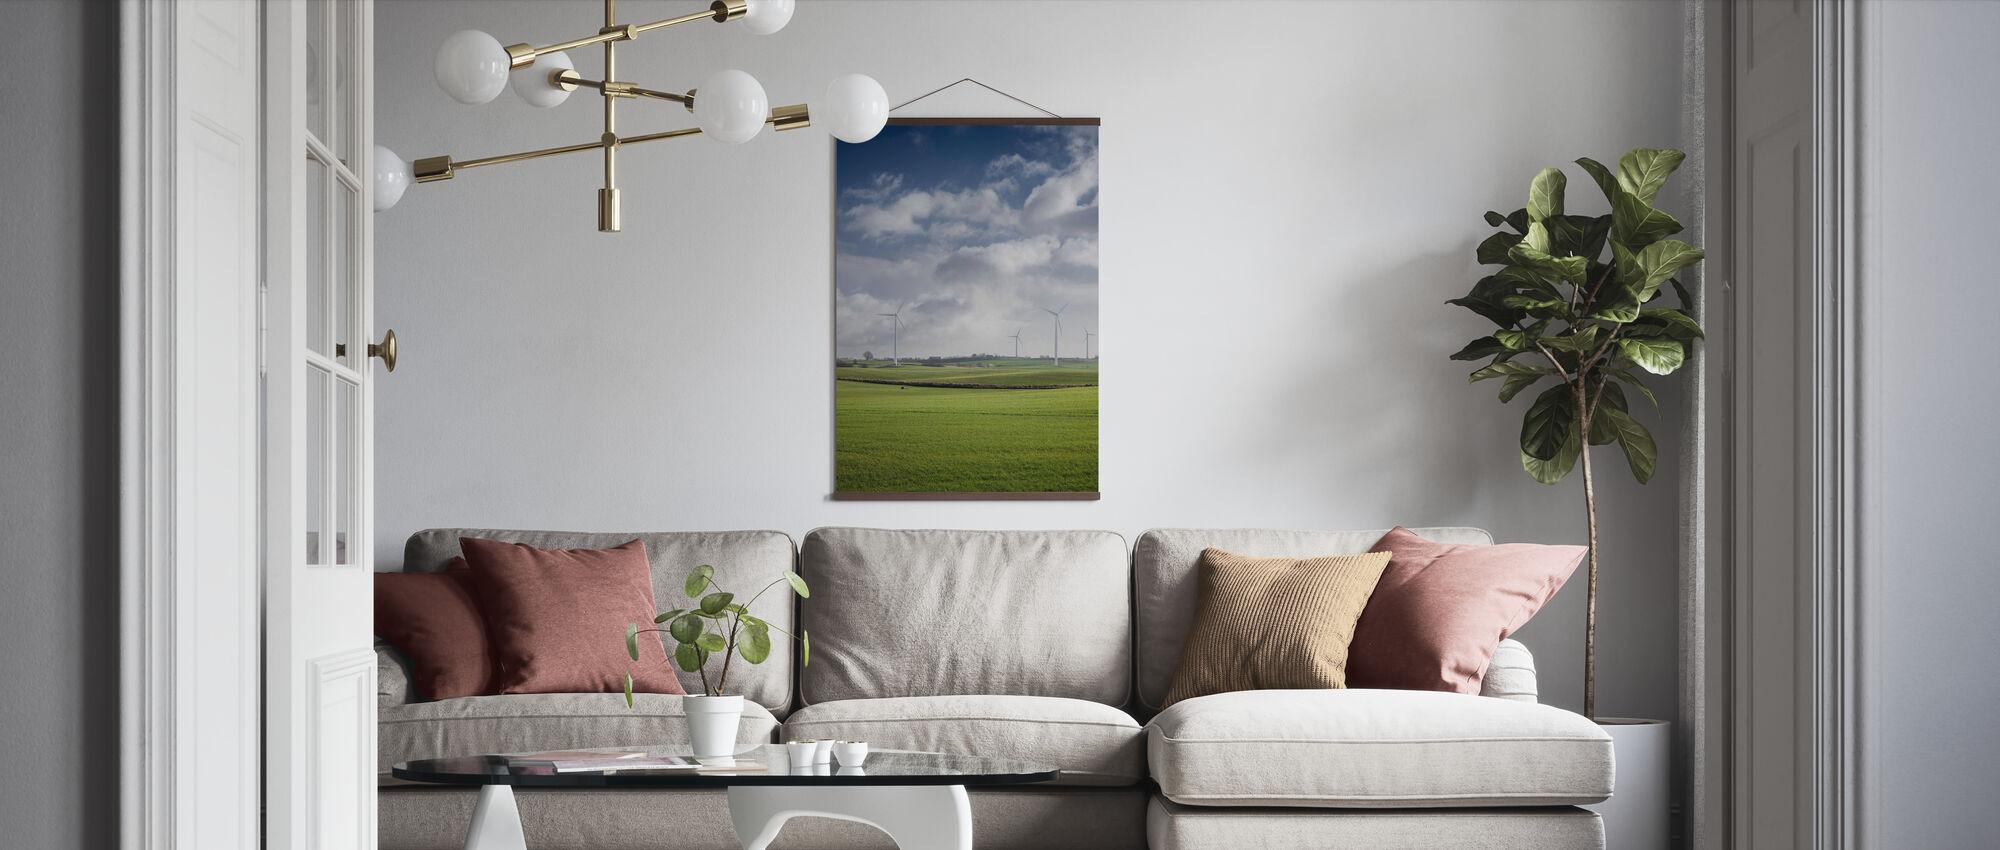 Windmill in Green Fields of Skåne, Sweden - Poster - Living Room